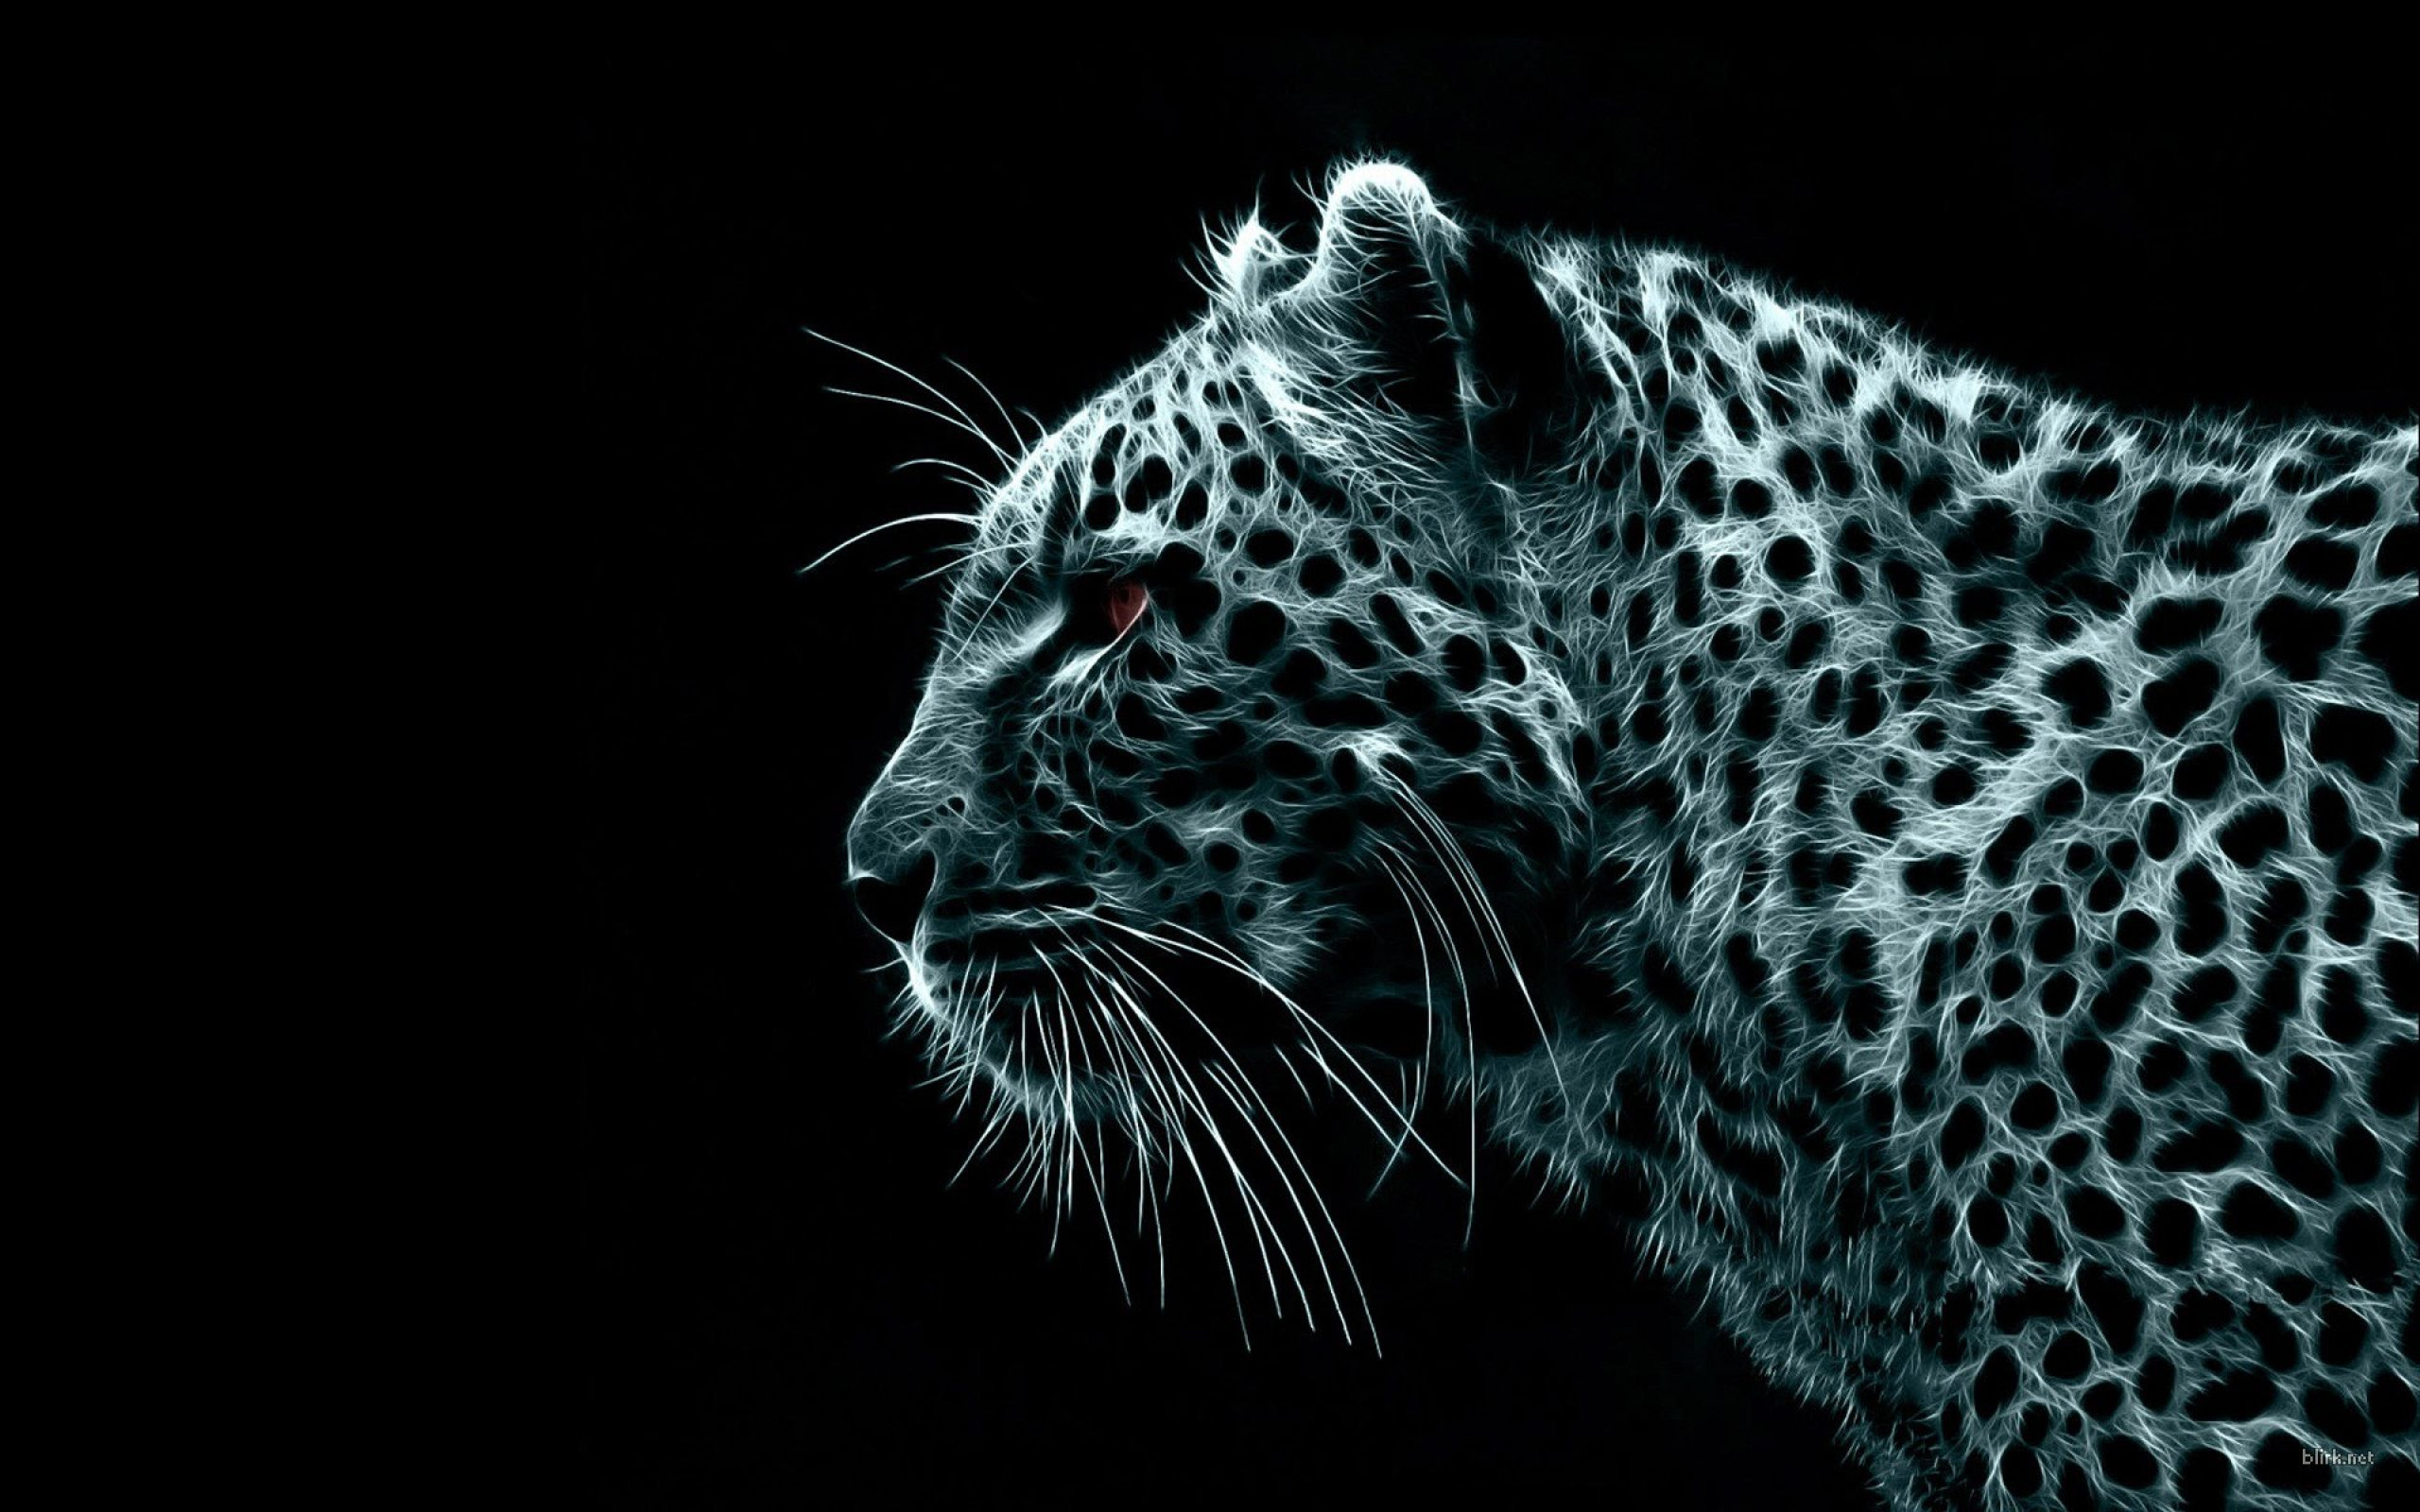 Animal HD Wallpaper